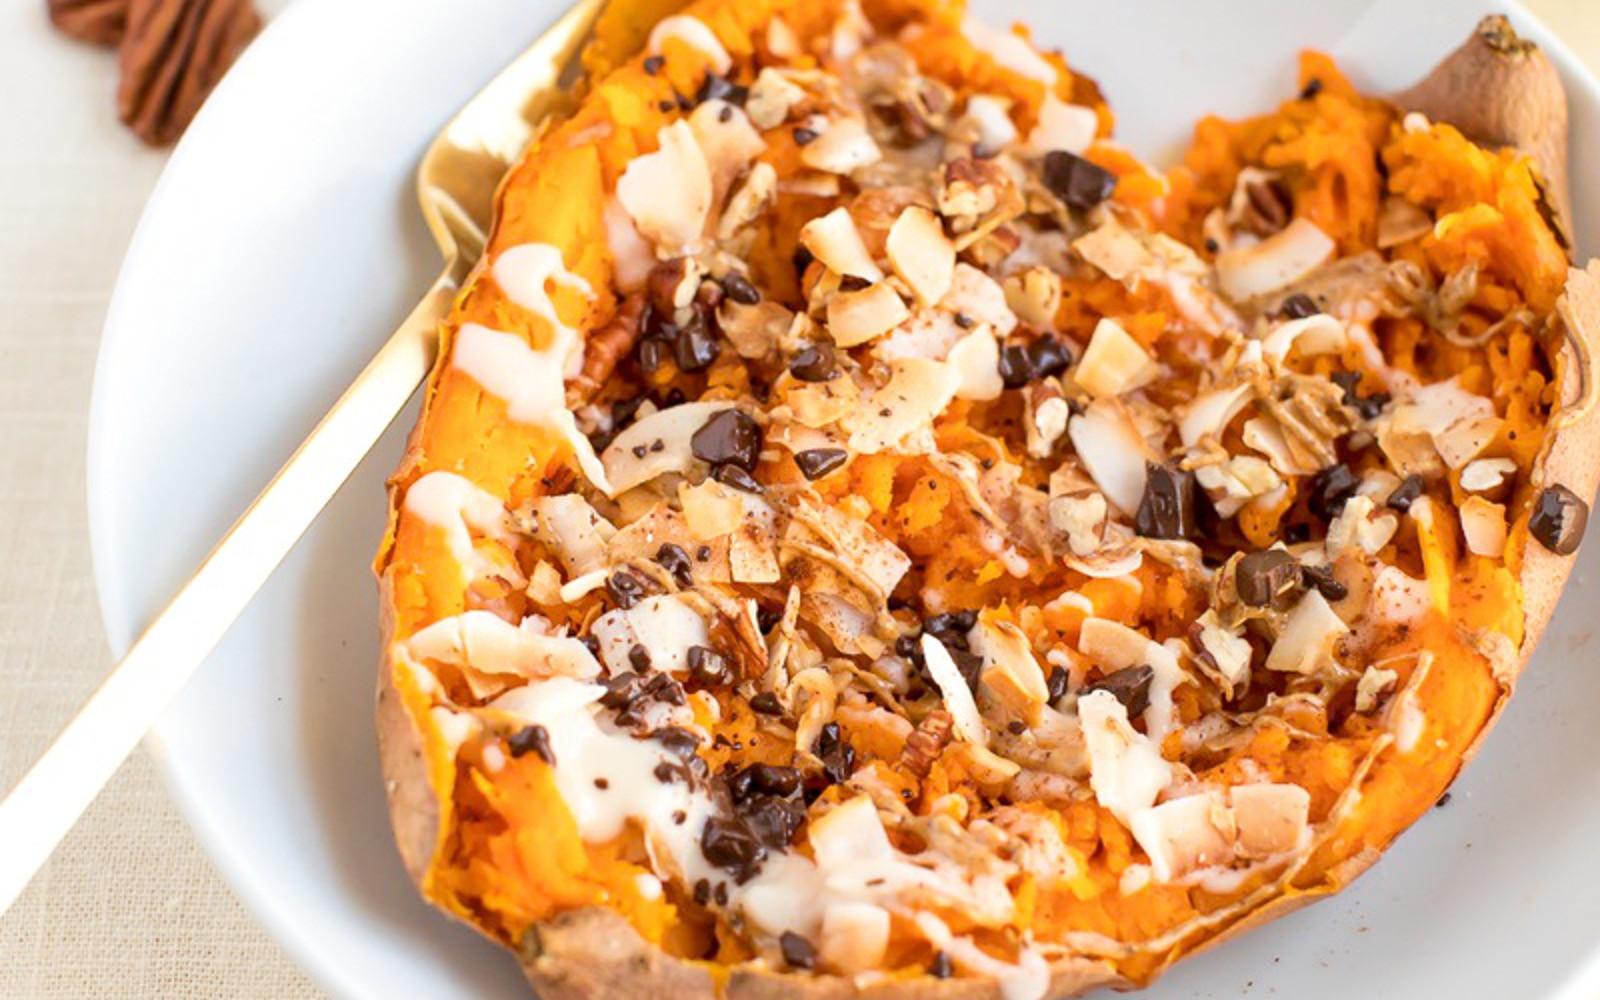 Healthy Sweet Potato Dessert  Healthy Dessert Baked Sweet Potato [Vegan] e Green